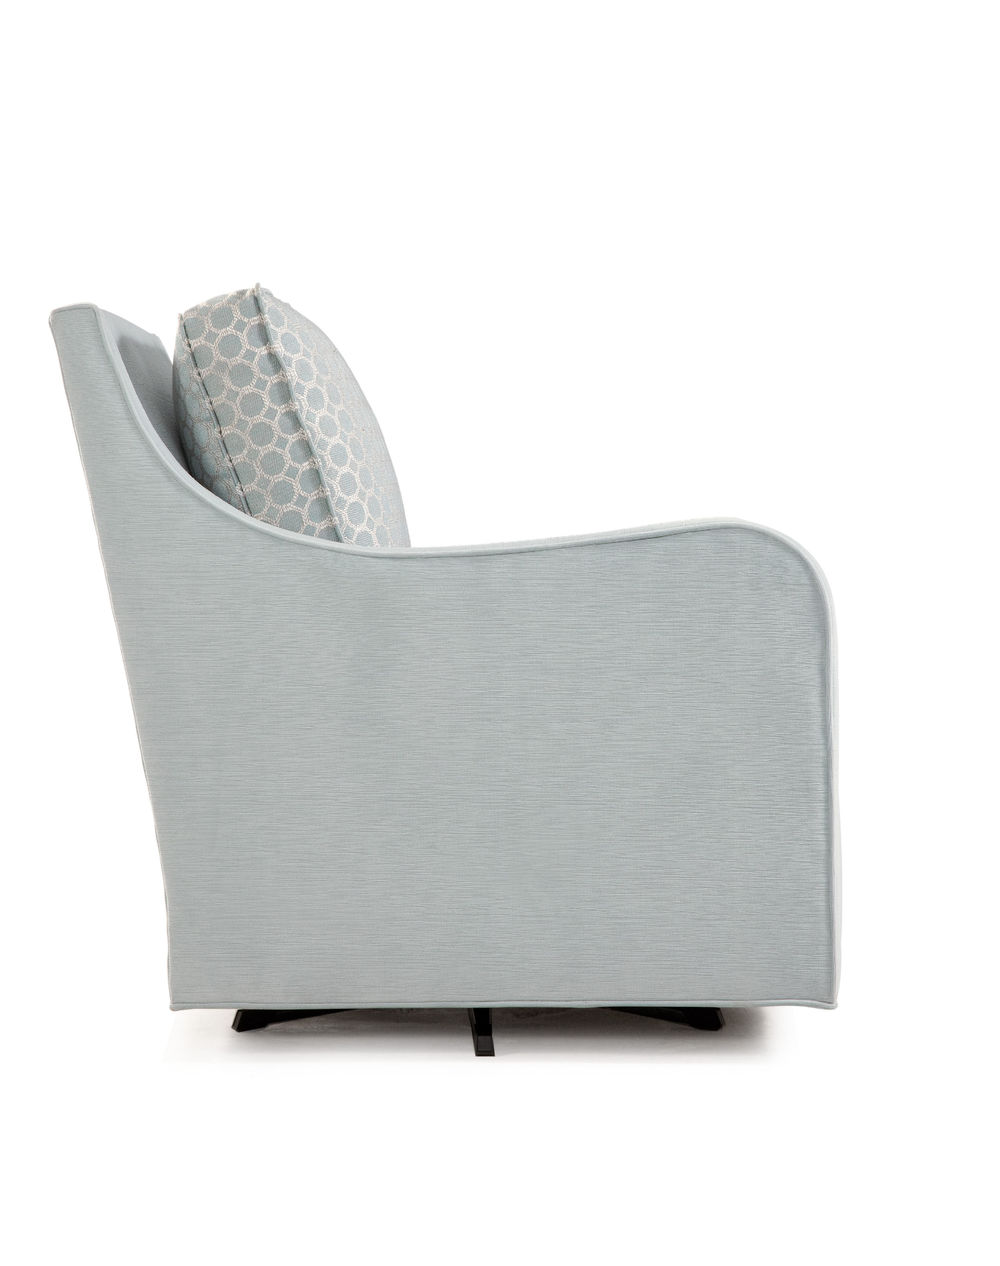 Braxton Culler - Koko Swivel Chair